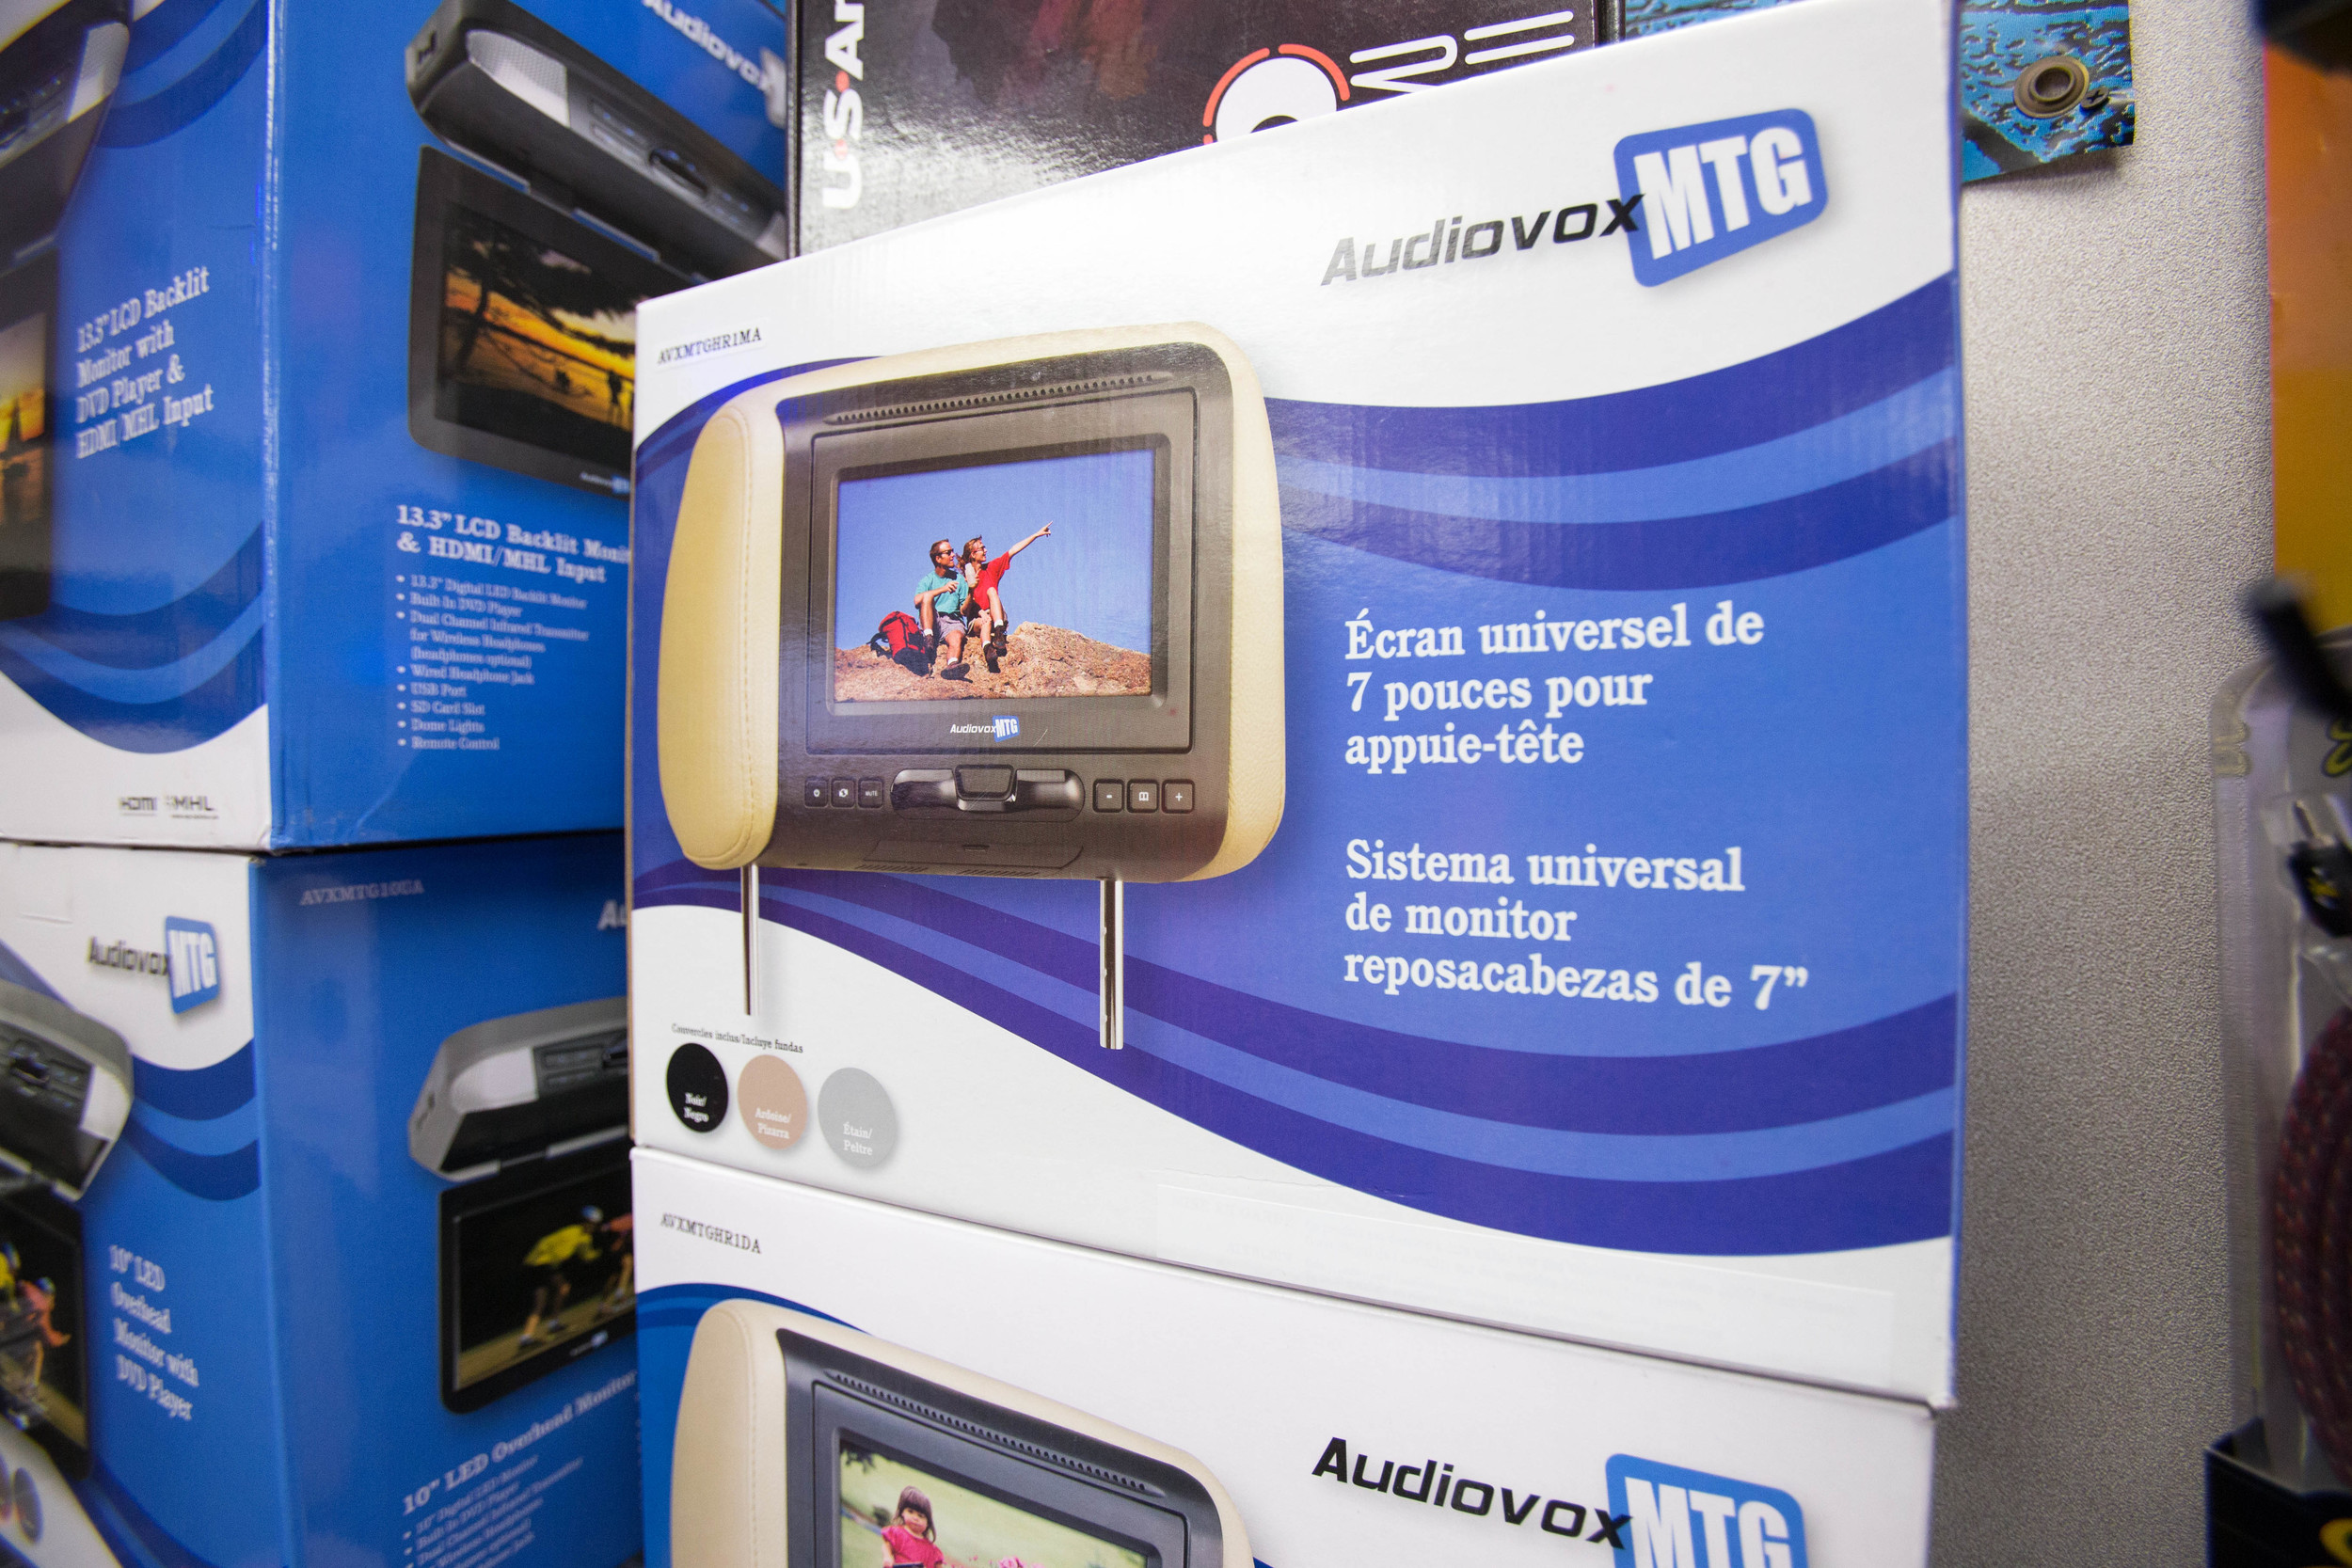 Audiovox Car Video Player